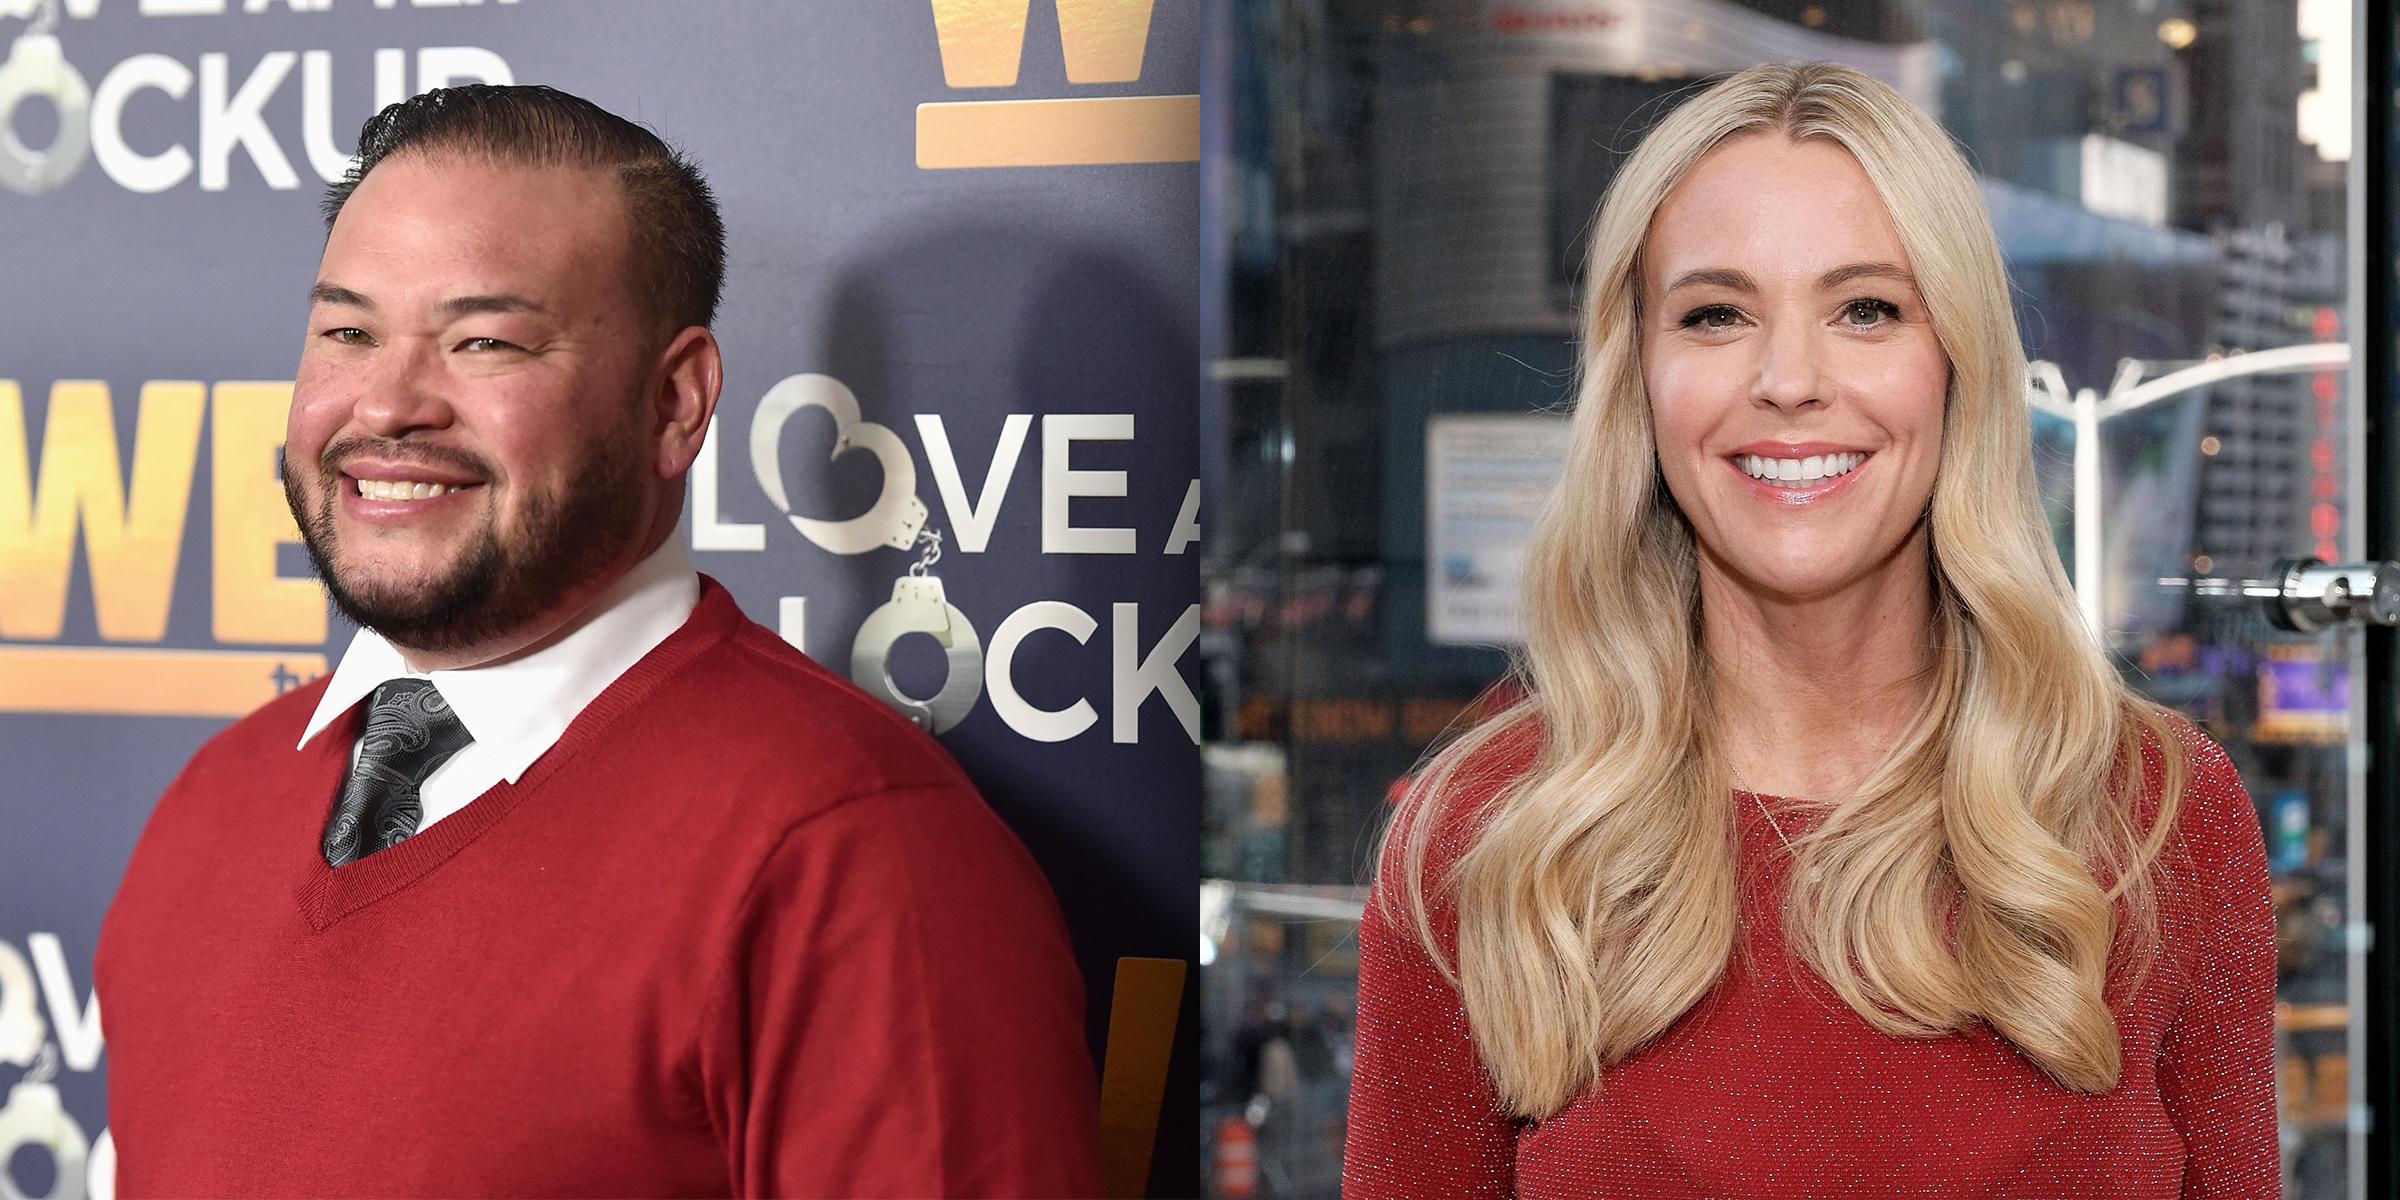 Jon Gosselin Accuses Kate Gosselin Of Abuse On Dr Oz